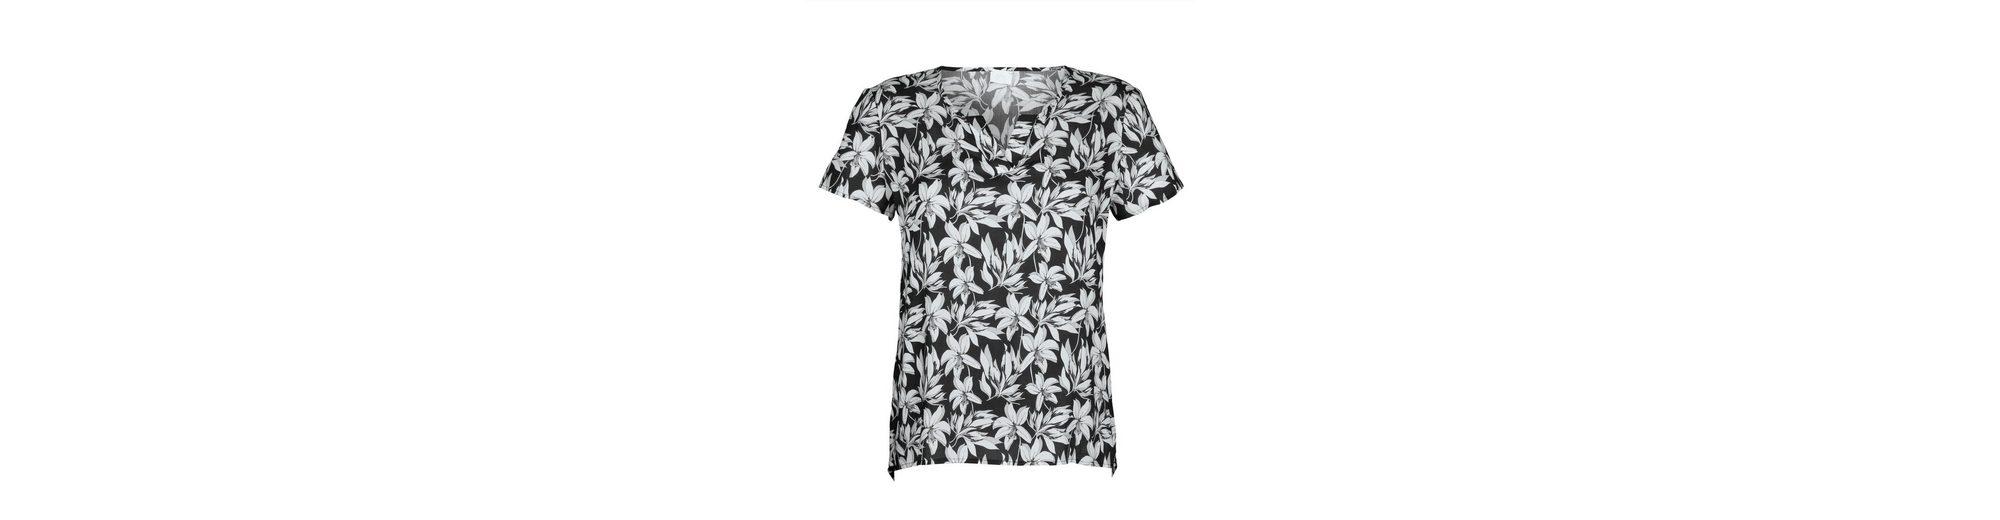 Alba Moda Blusenshirt aus reiner Viskose Marktfähig r4V37ED